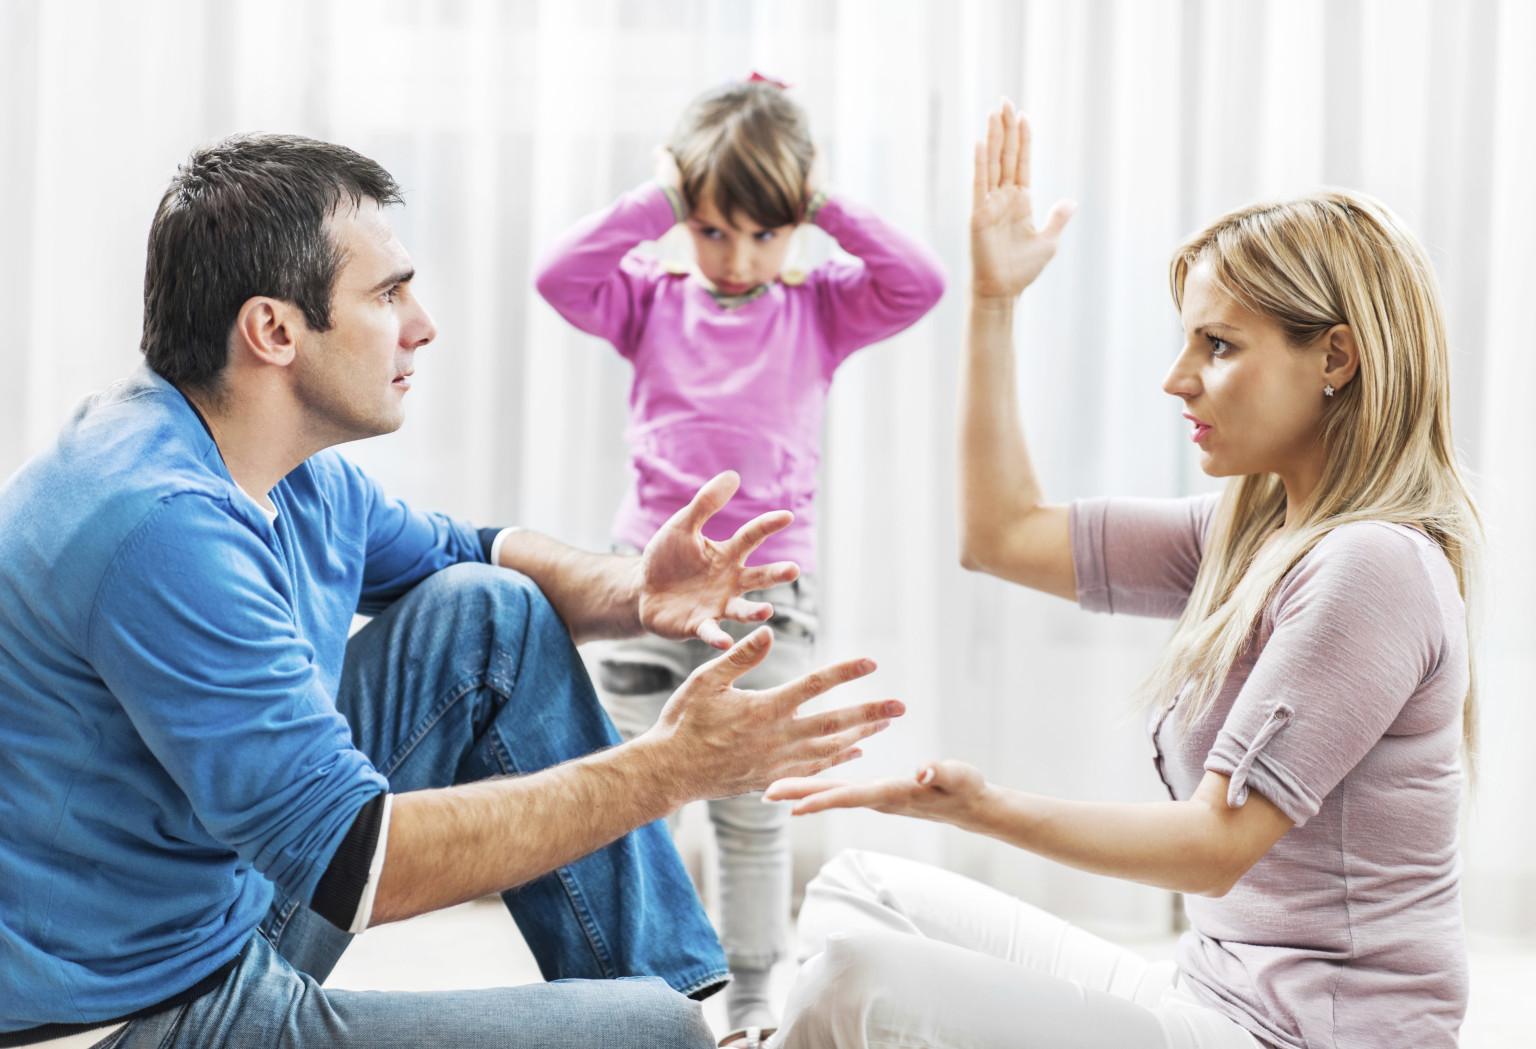 parent and children relationships